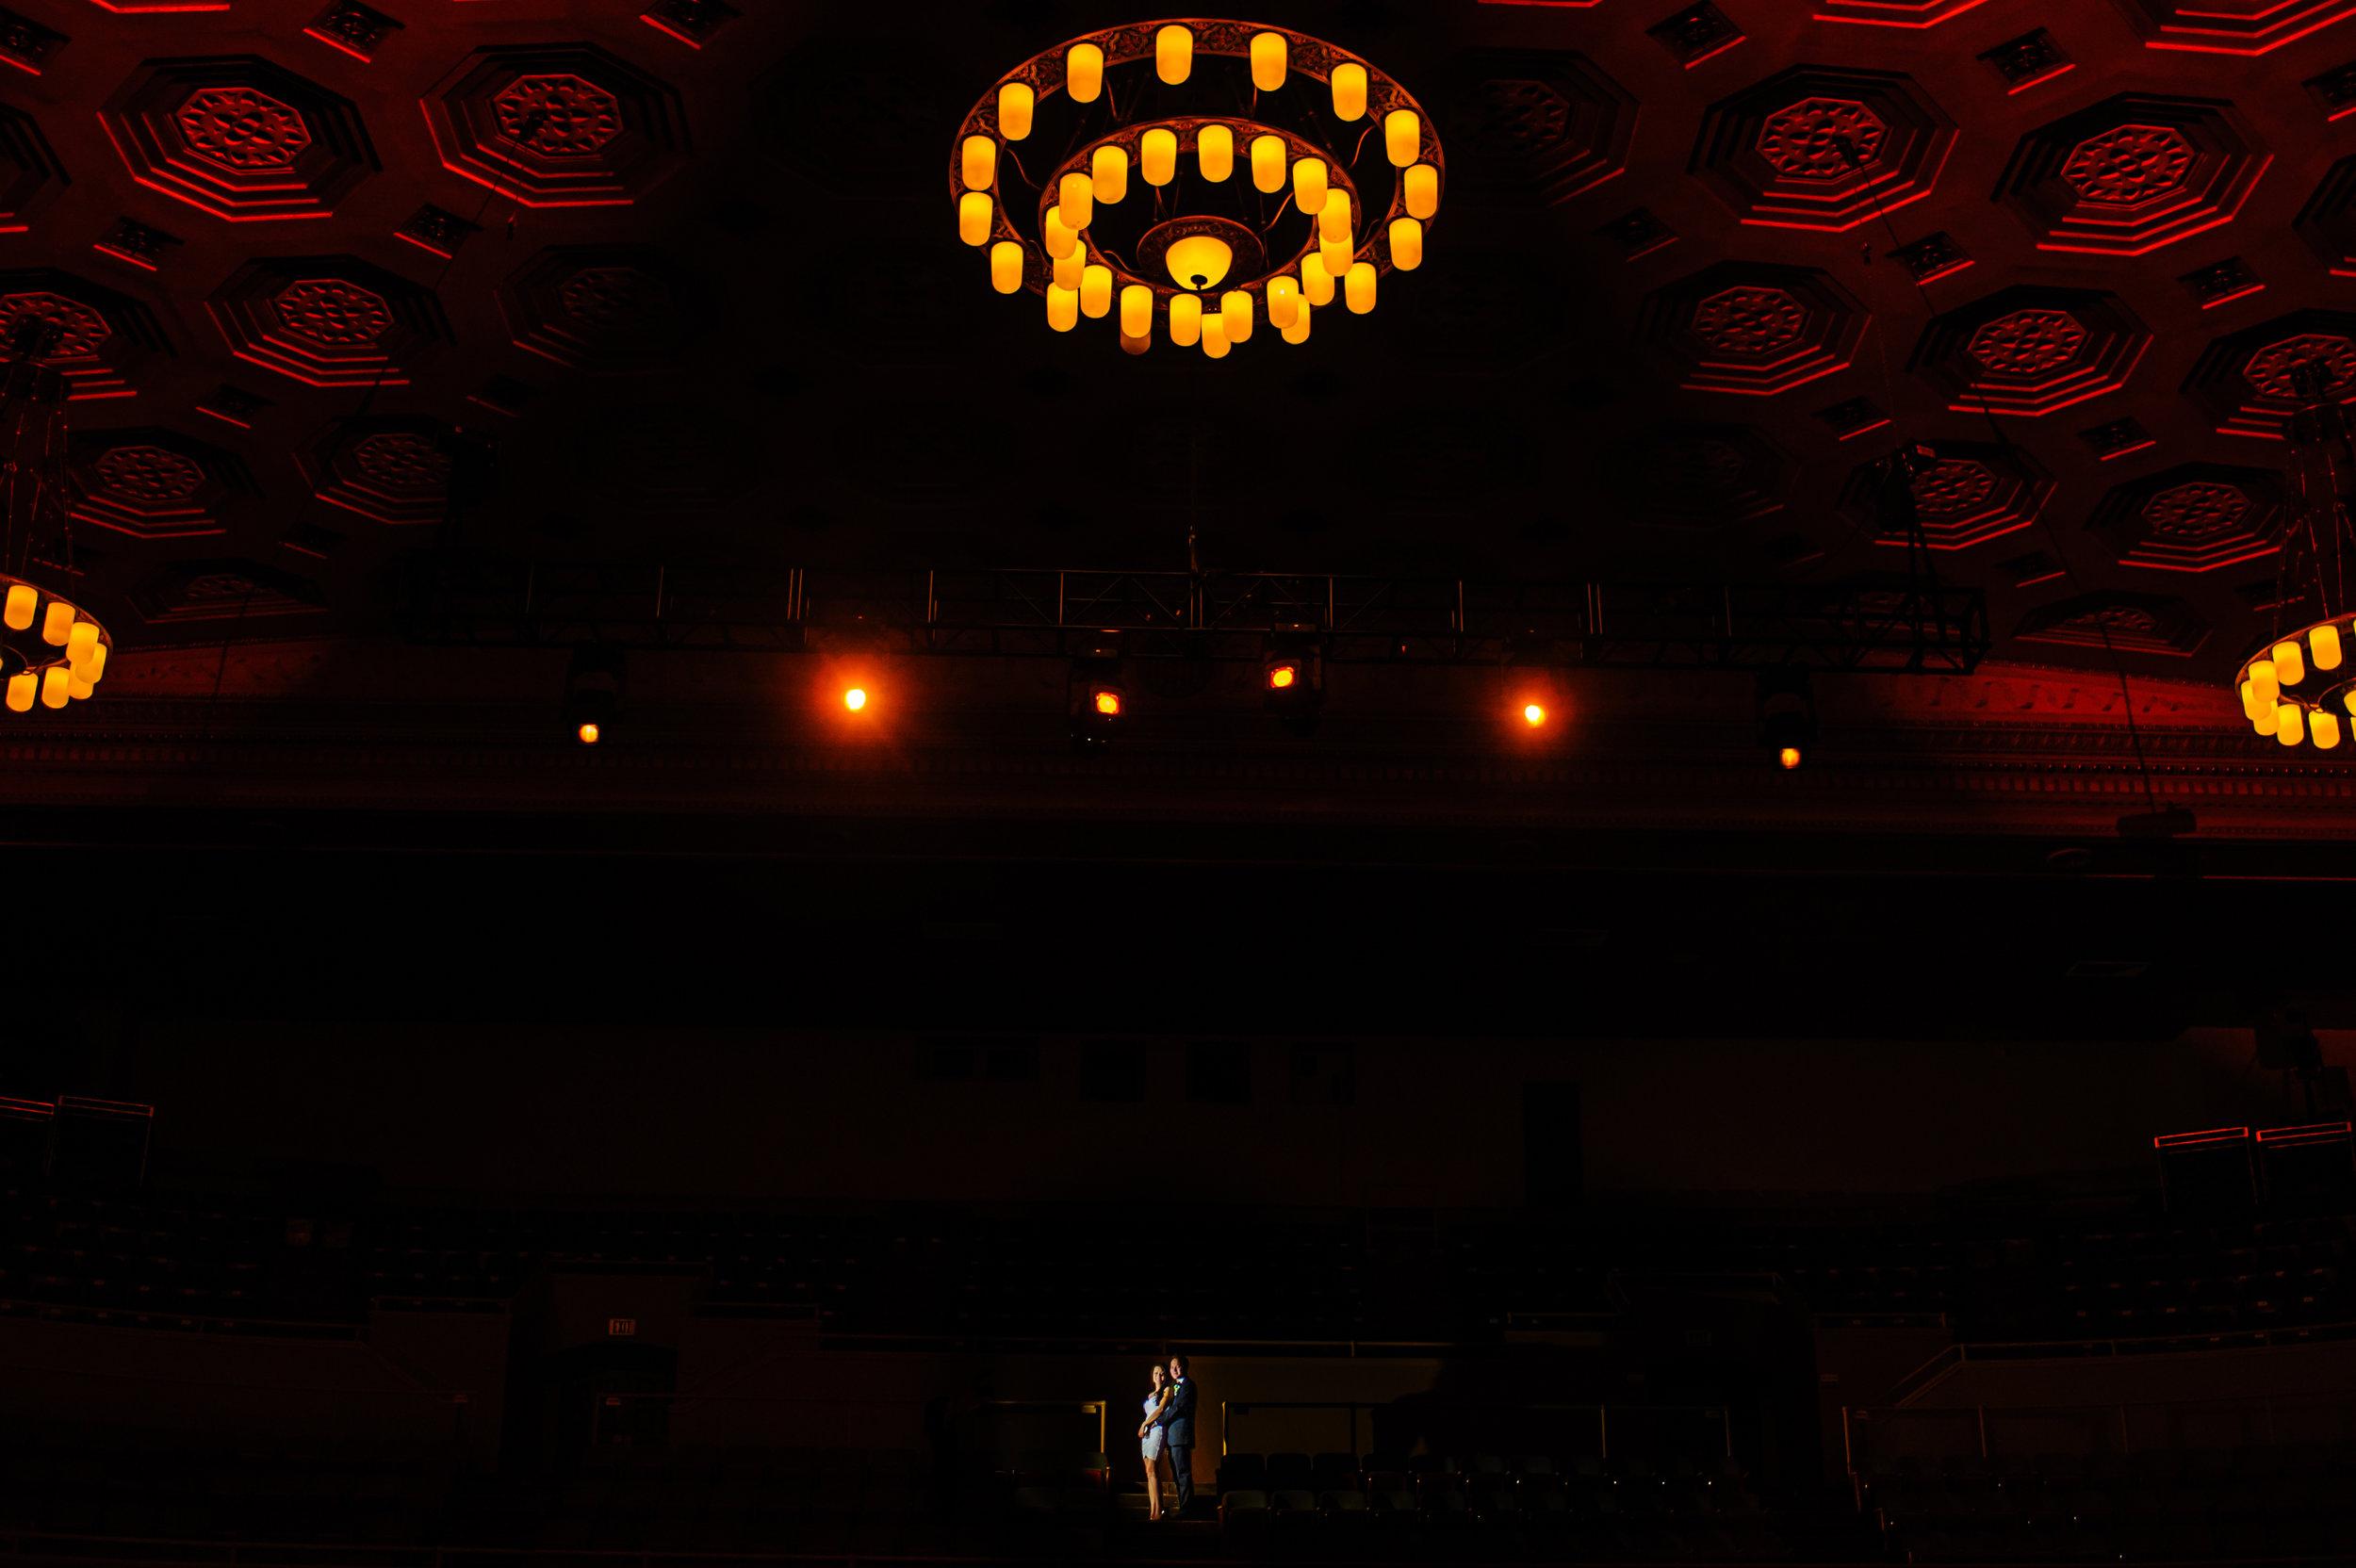 camilla-thuy-095-memorial-auditorium-sacramento-wedding-photographer-katherine-nicole-photography.JPG